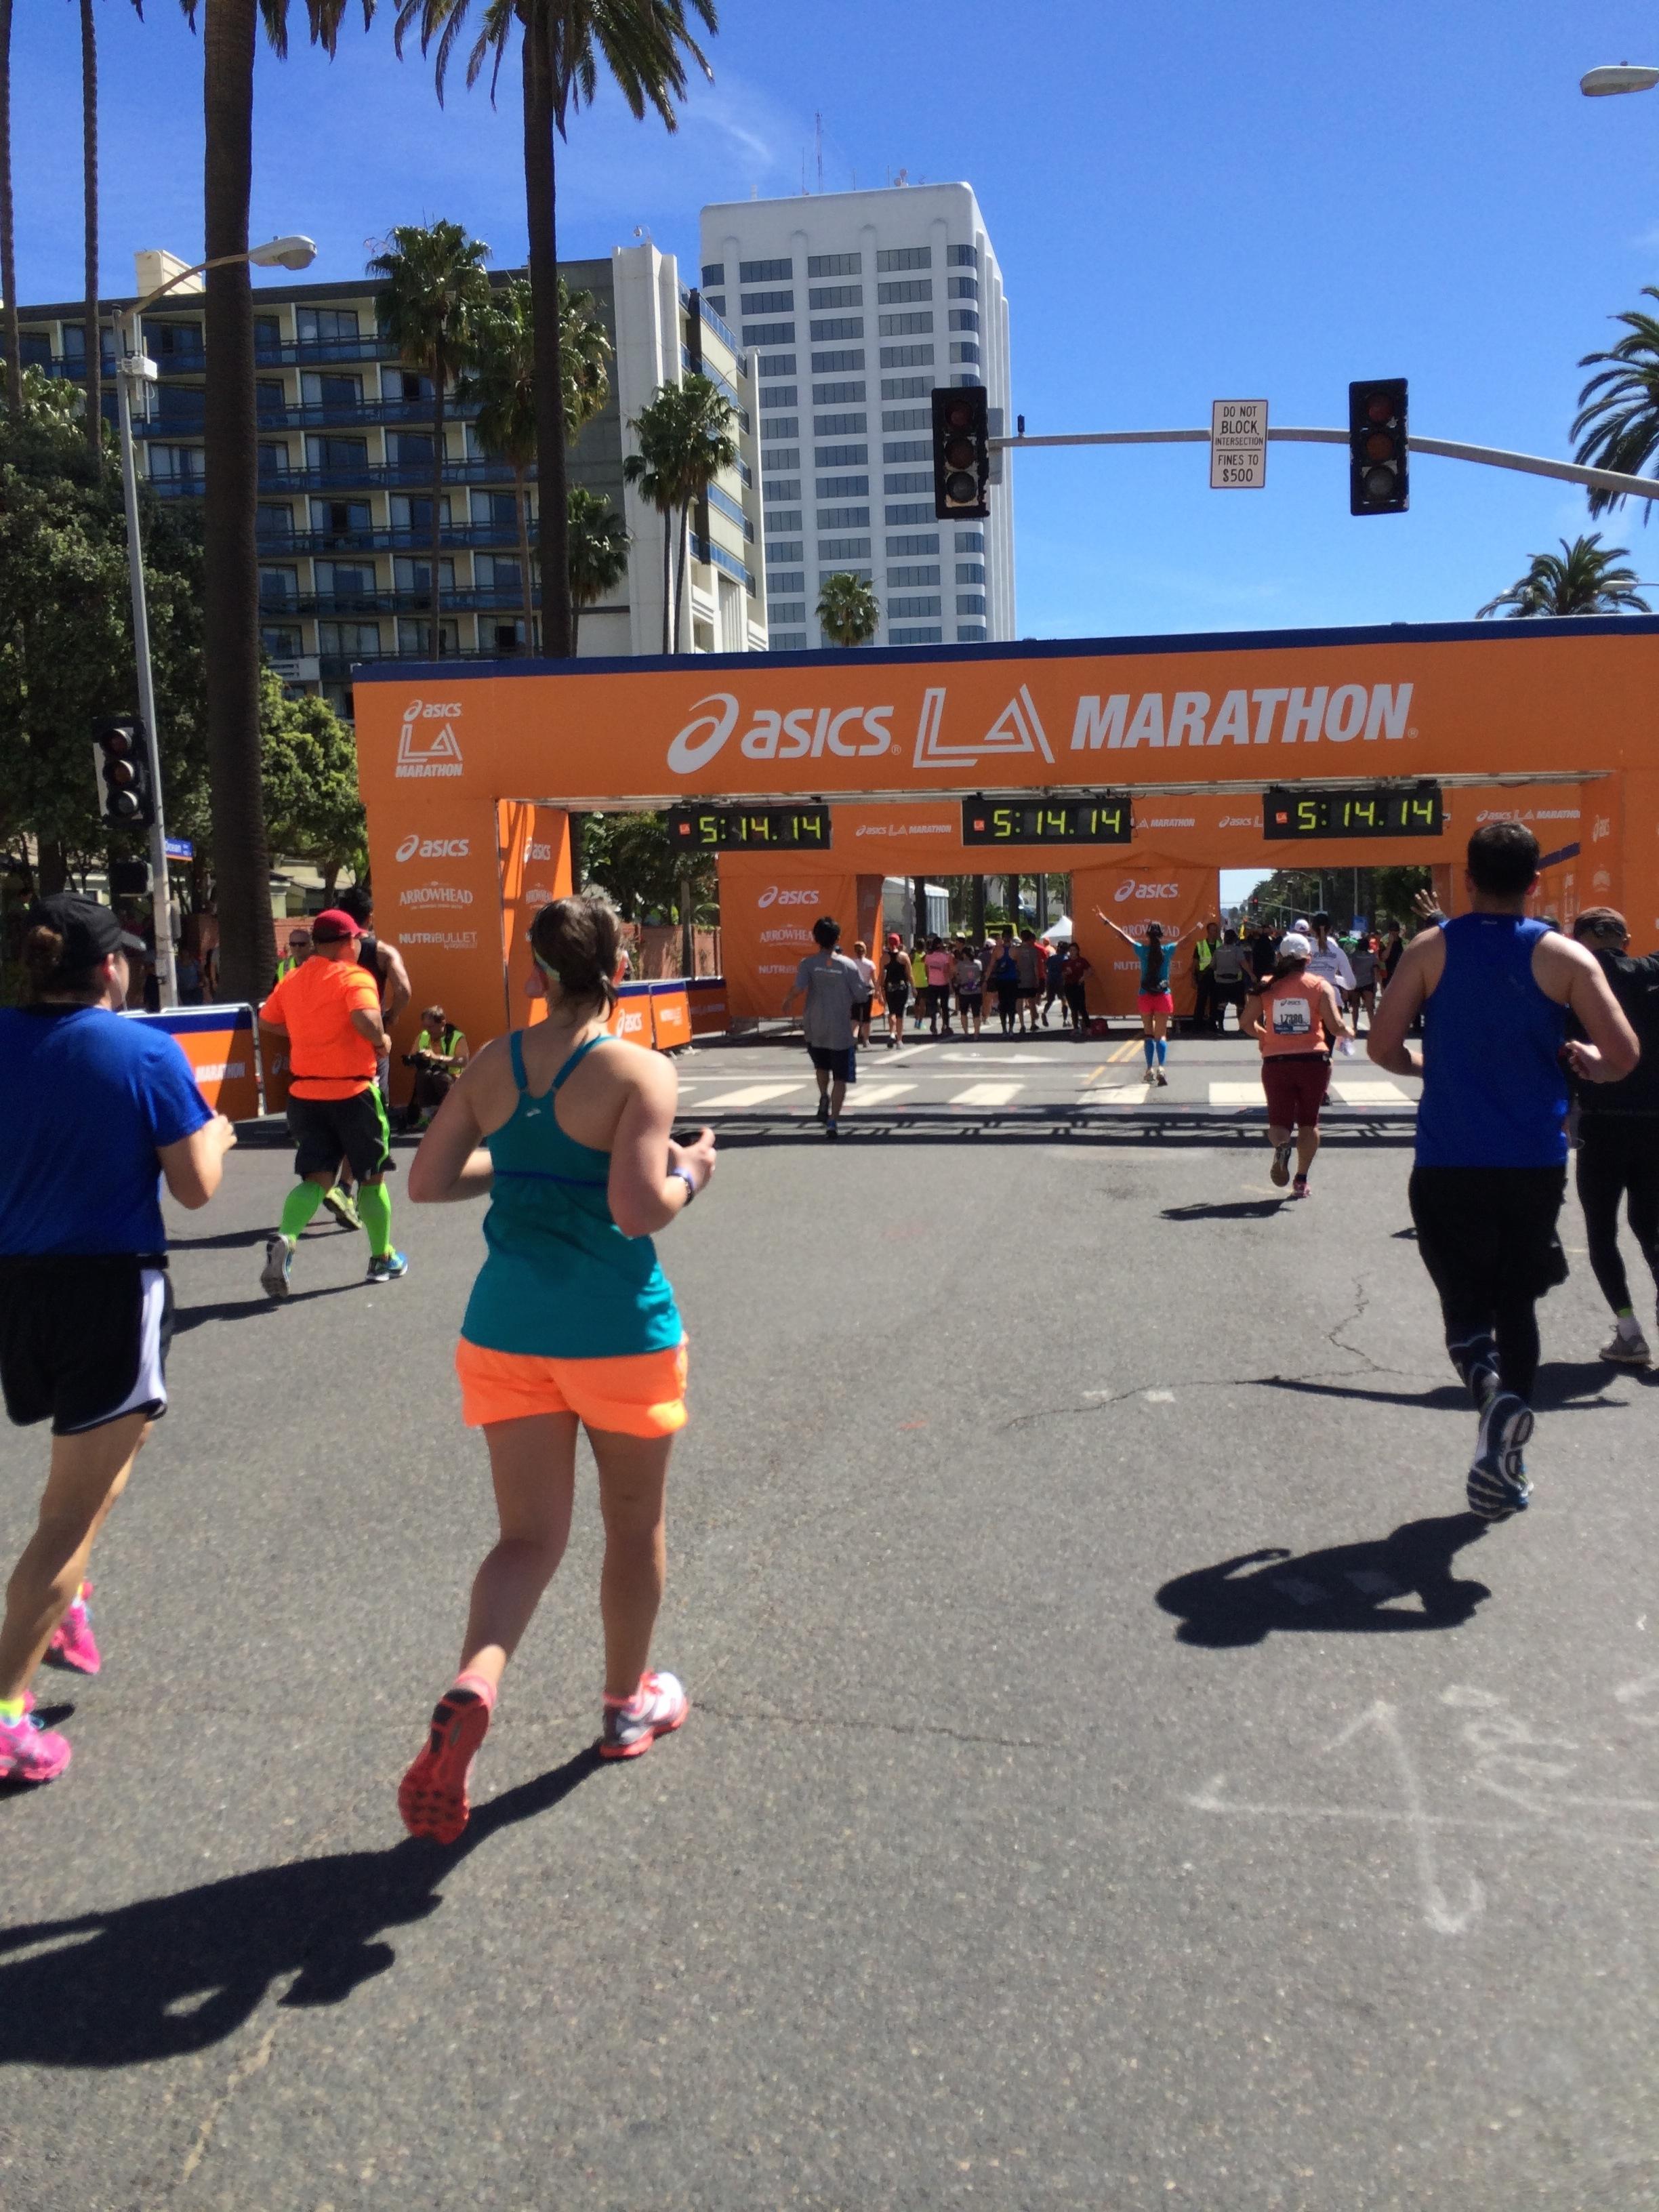 LA-Marathon-Finish-Line